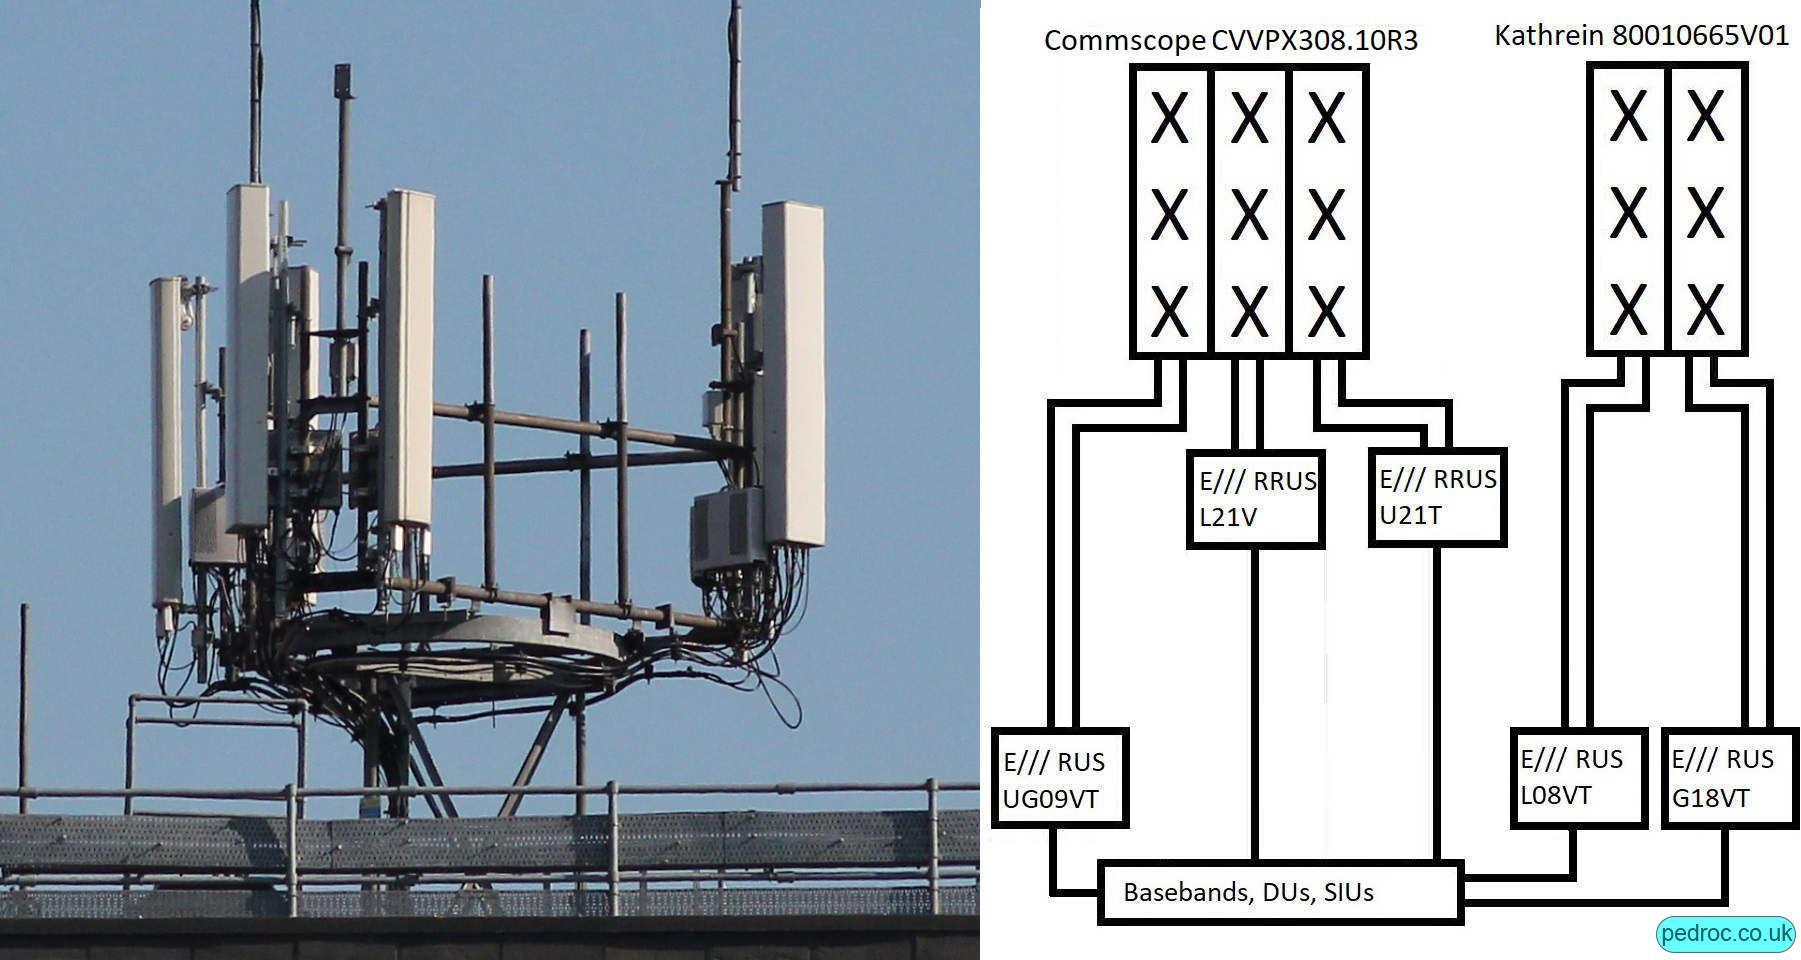 Medium-High Configuration with split 2100MHz using Ericsson RRUS12, Commscope CVVPX308.10R3 and Kathrein 80010665V01 antennas. Also G18.